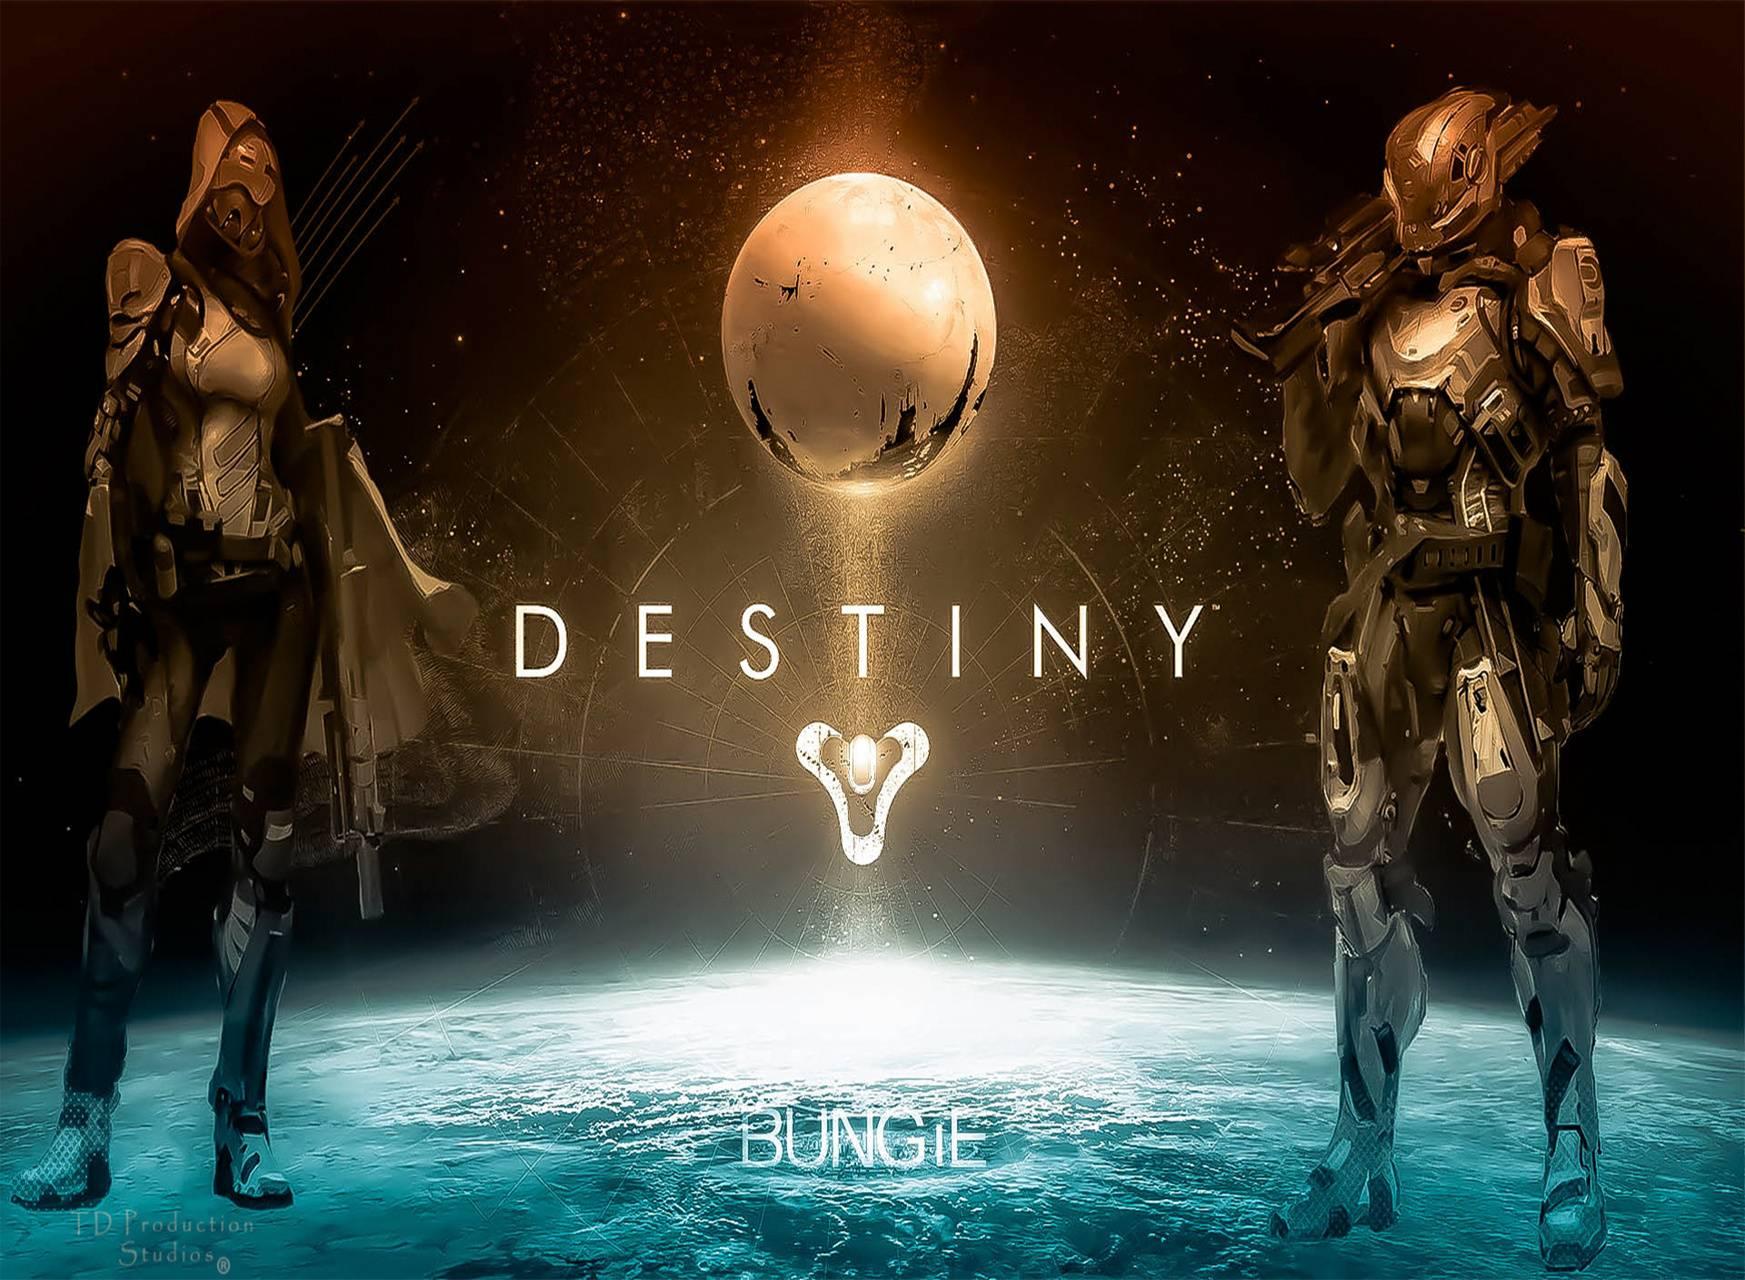 Bungies Destiny